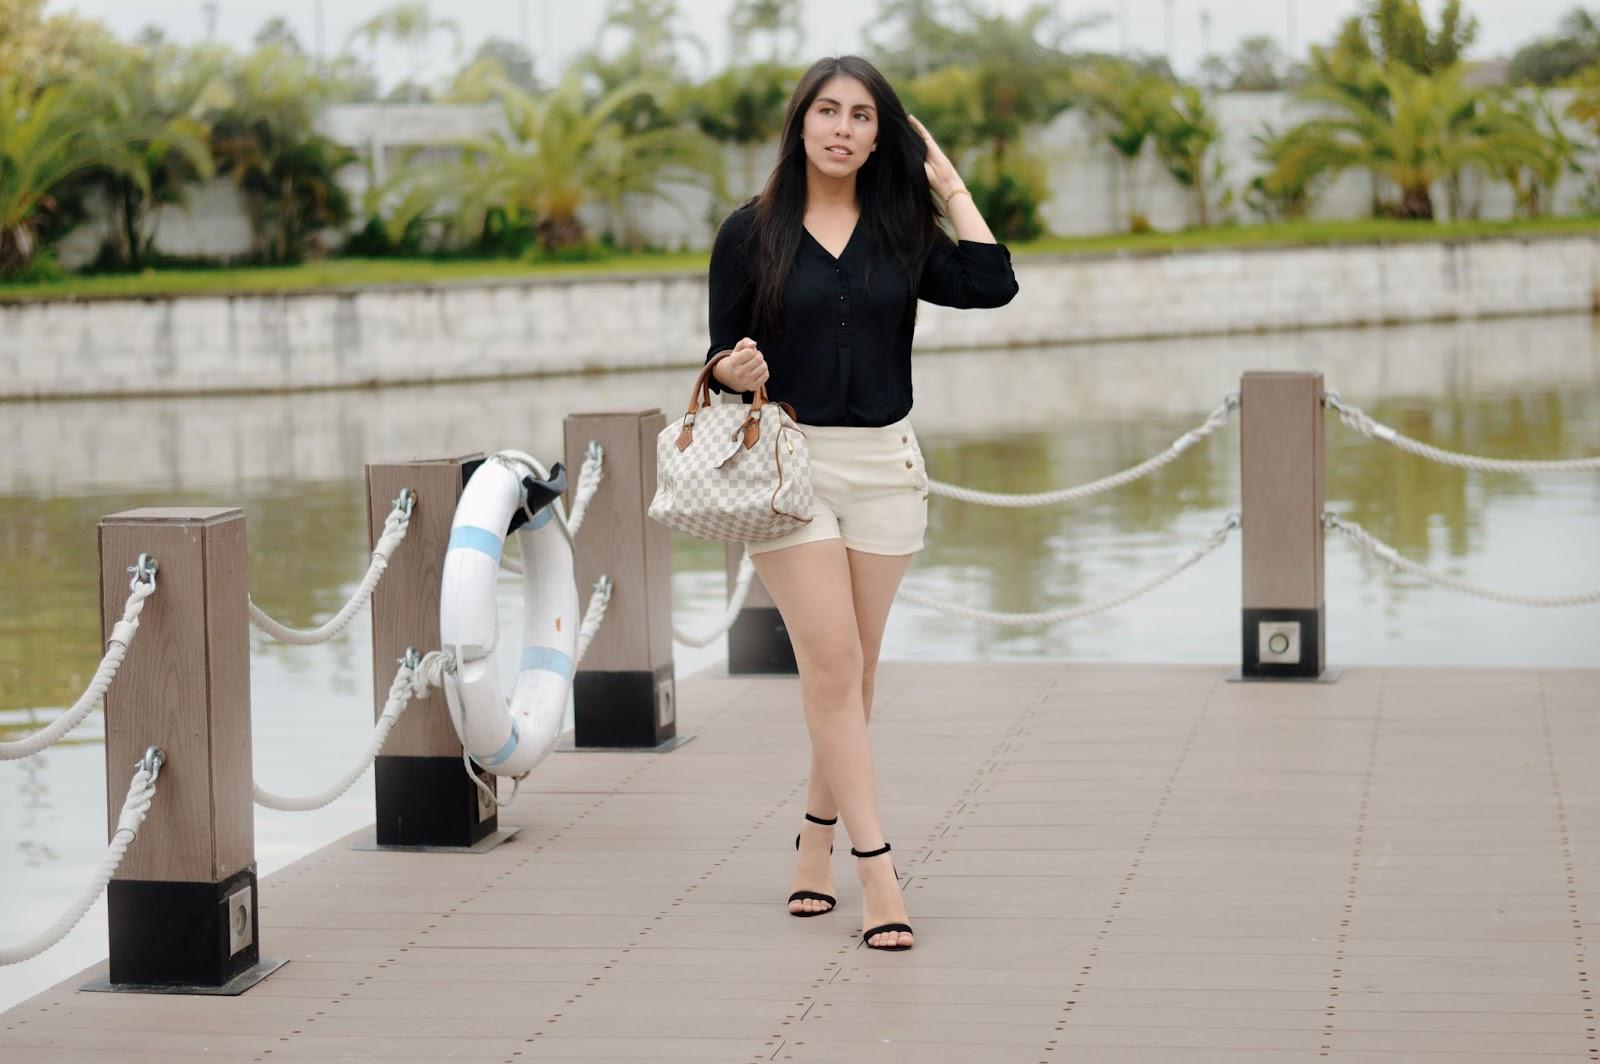 silvia-armas-make-it-look-good-blusa-negra-dress-short-formal-tumblr-girl-top-style-fashion-blogger-ecuador